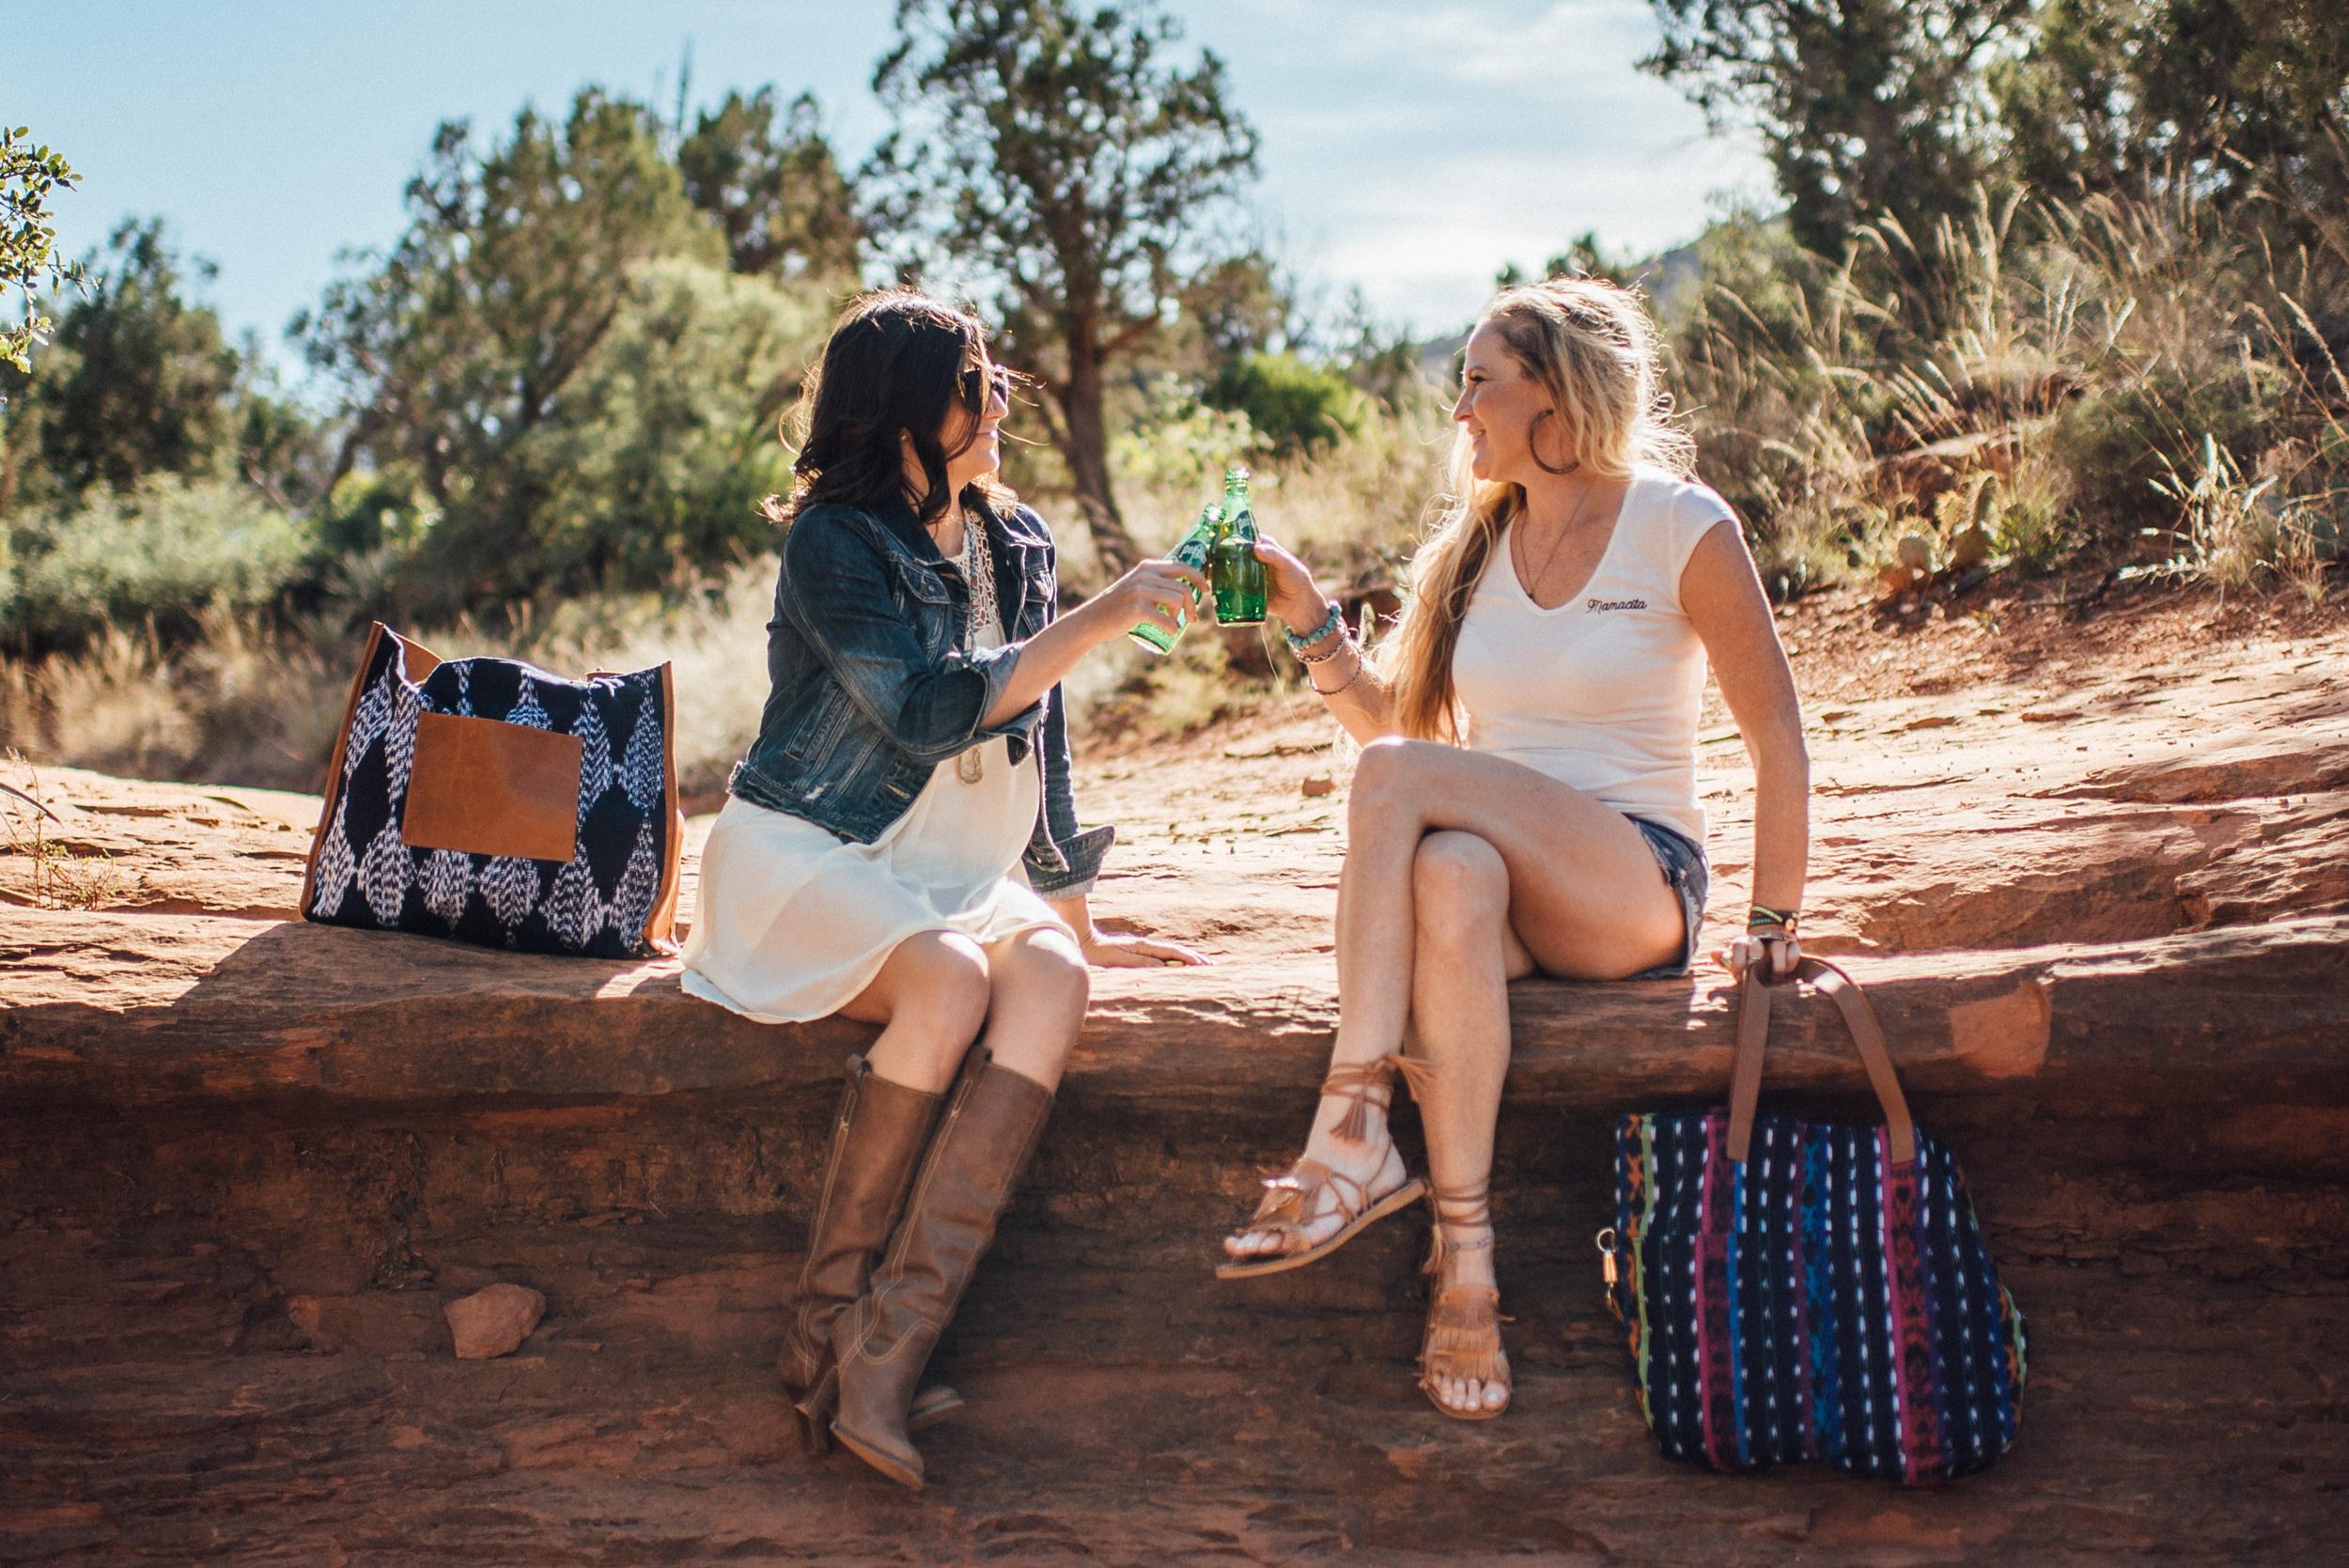 Arizona-Boho-Wedding-Photographer-Handbags-13.jpg